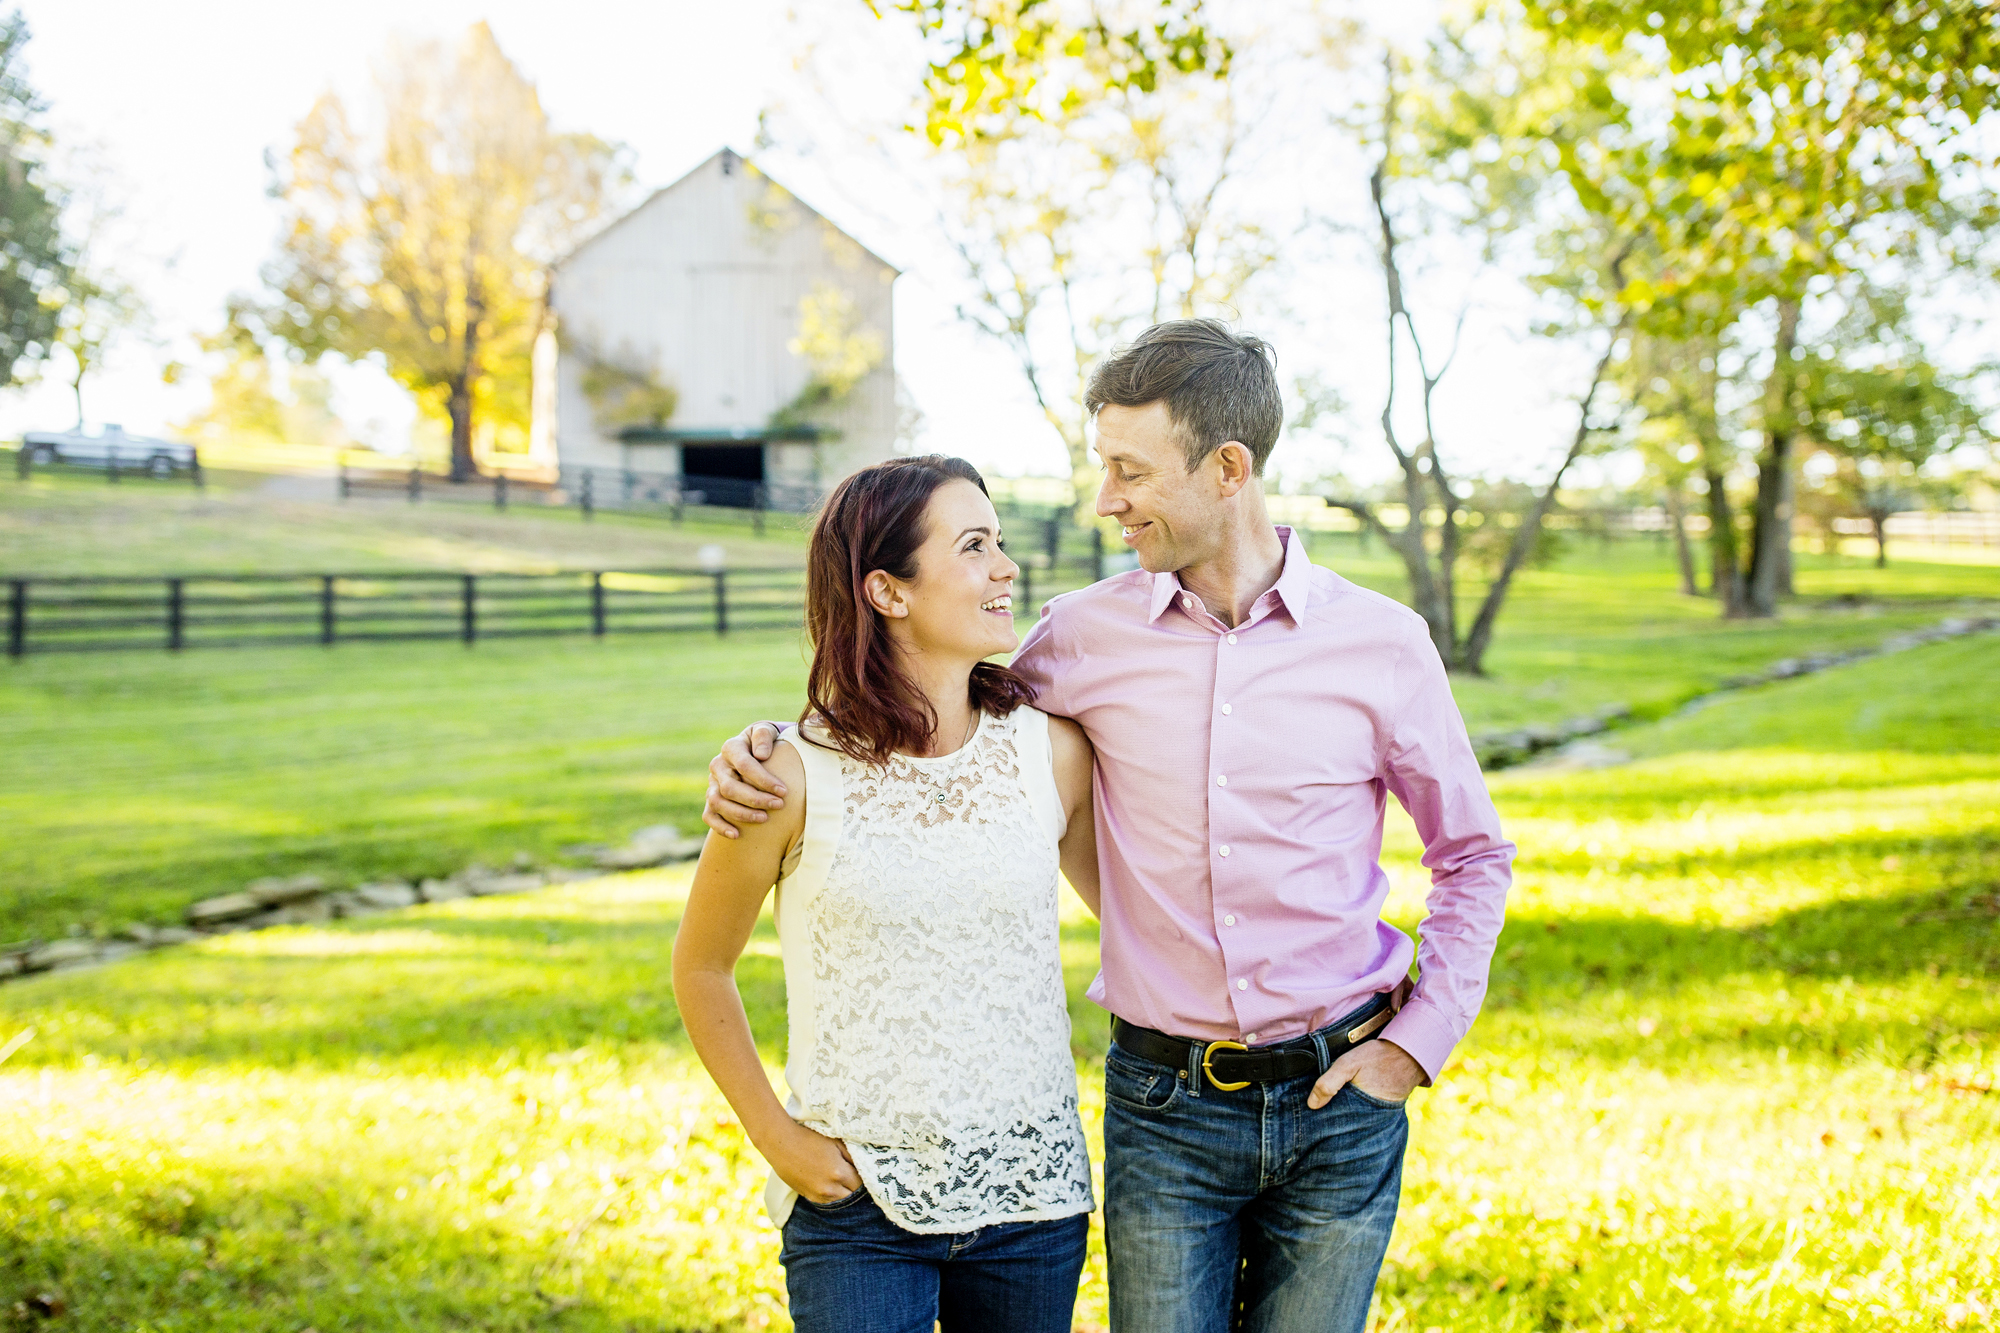 Seriously_Sabrina_Photography_Lexington_Kentucky_Burl_Winstar_Farm_Engagement_AliJerry_6.jpg